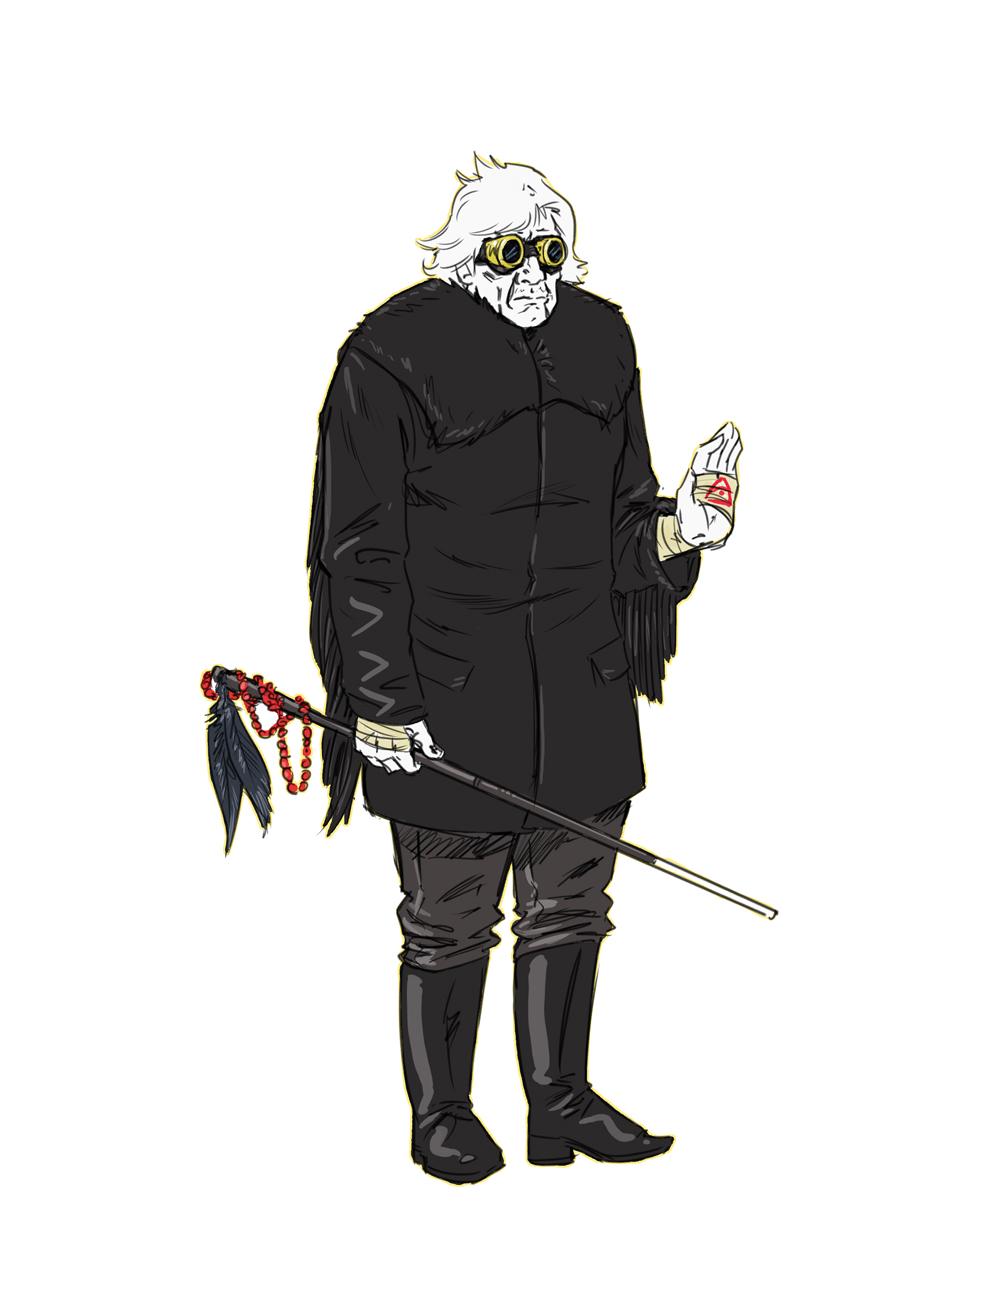 Concept_The Blind Man_09.jpg